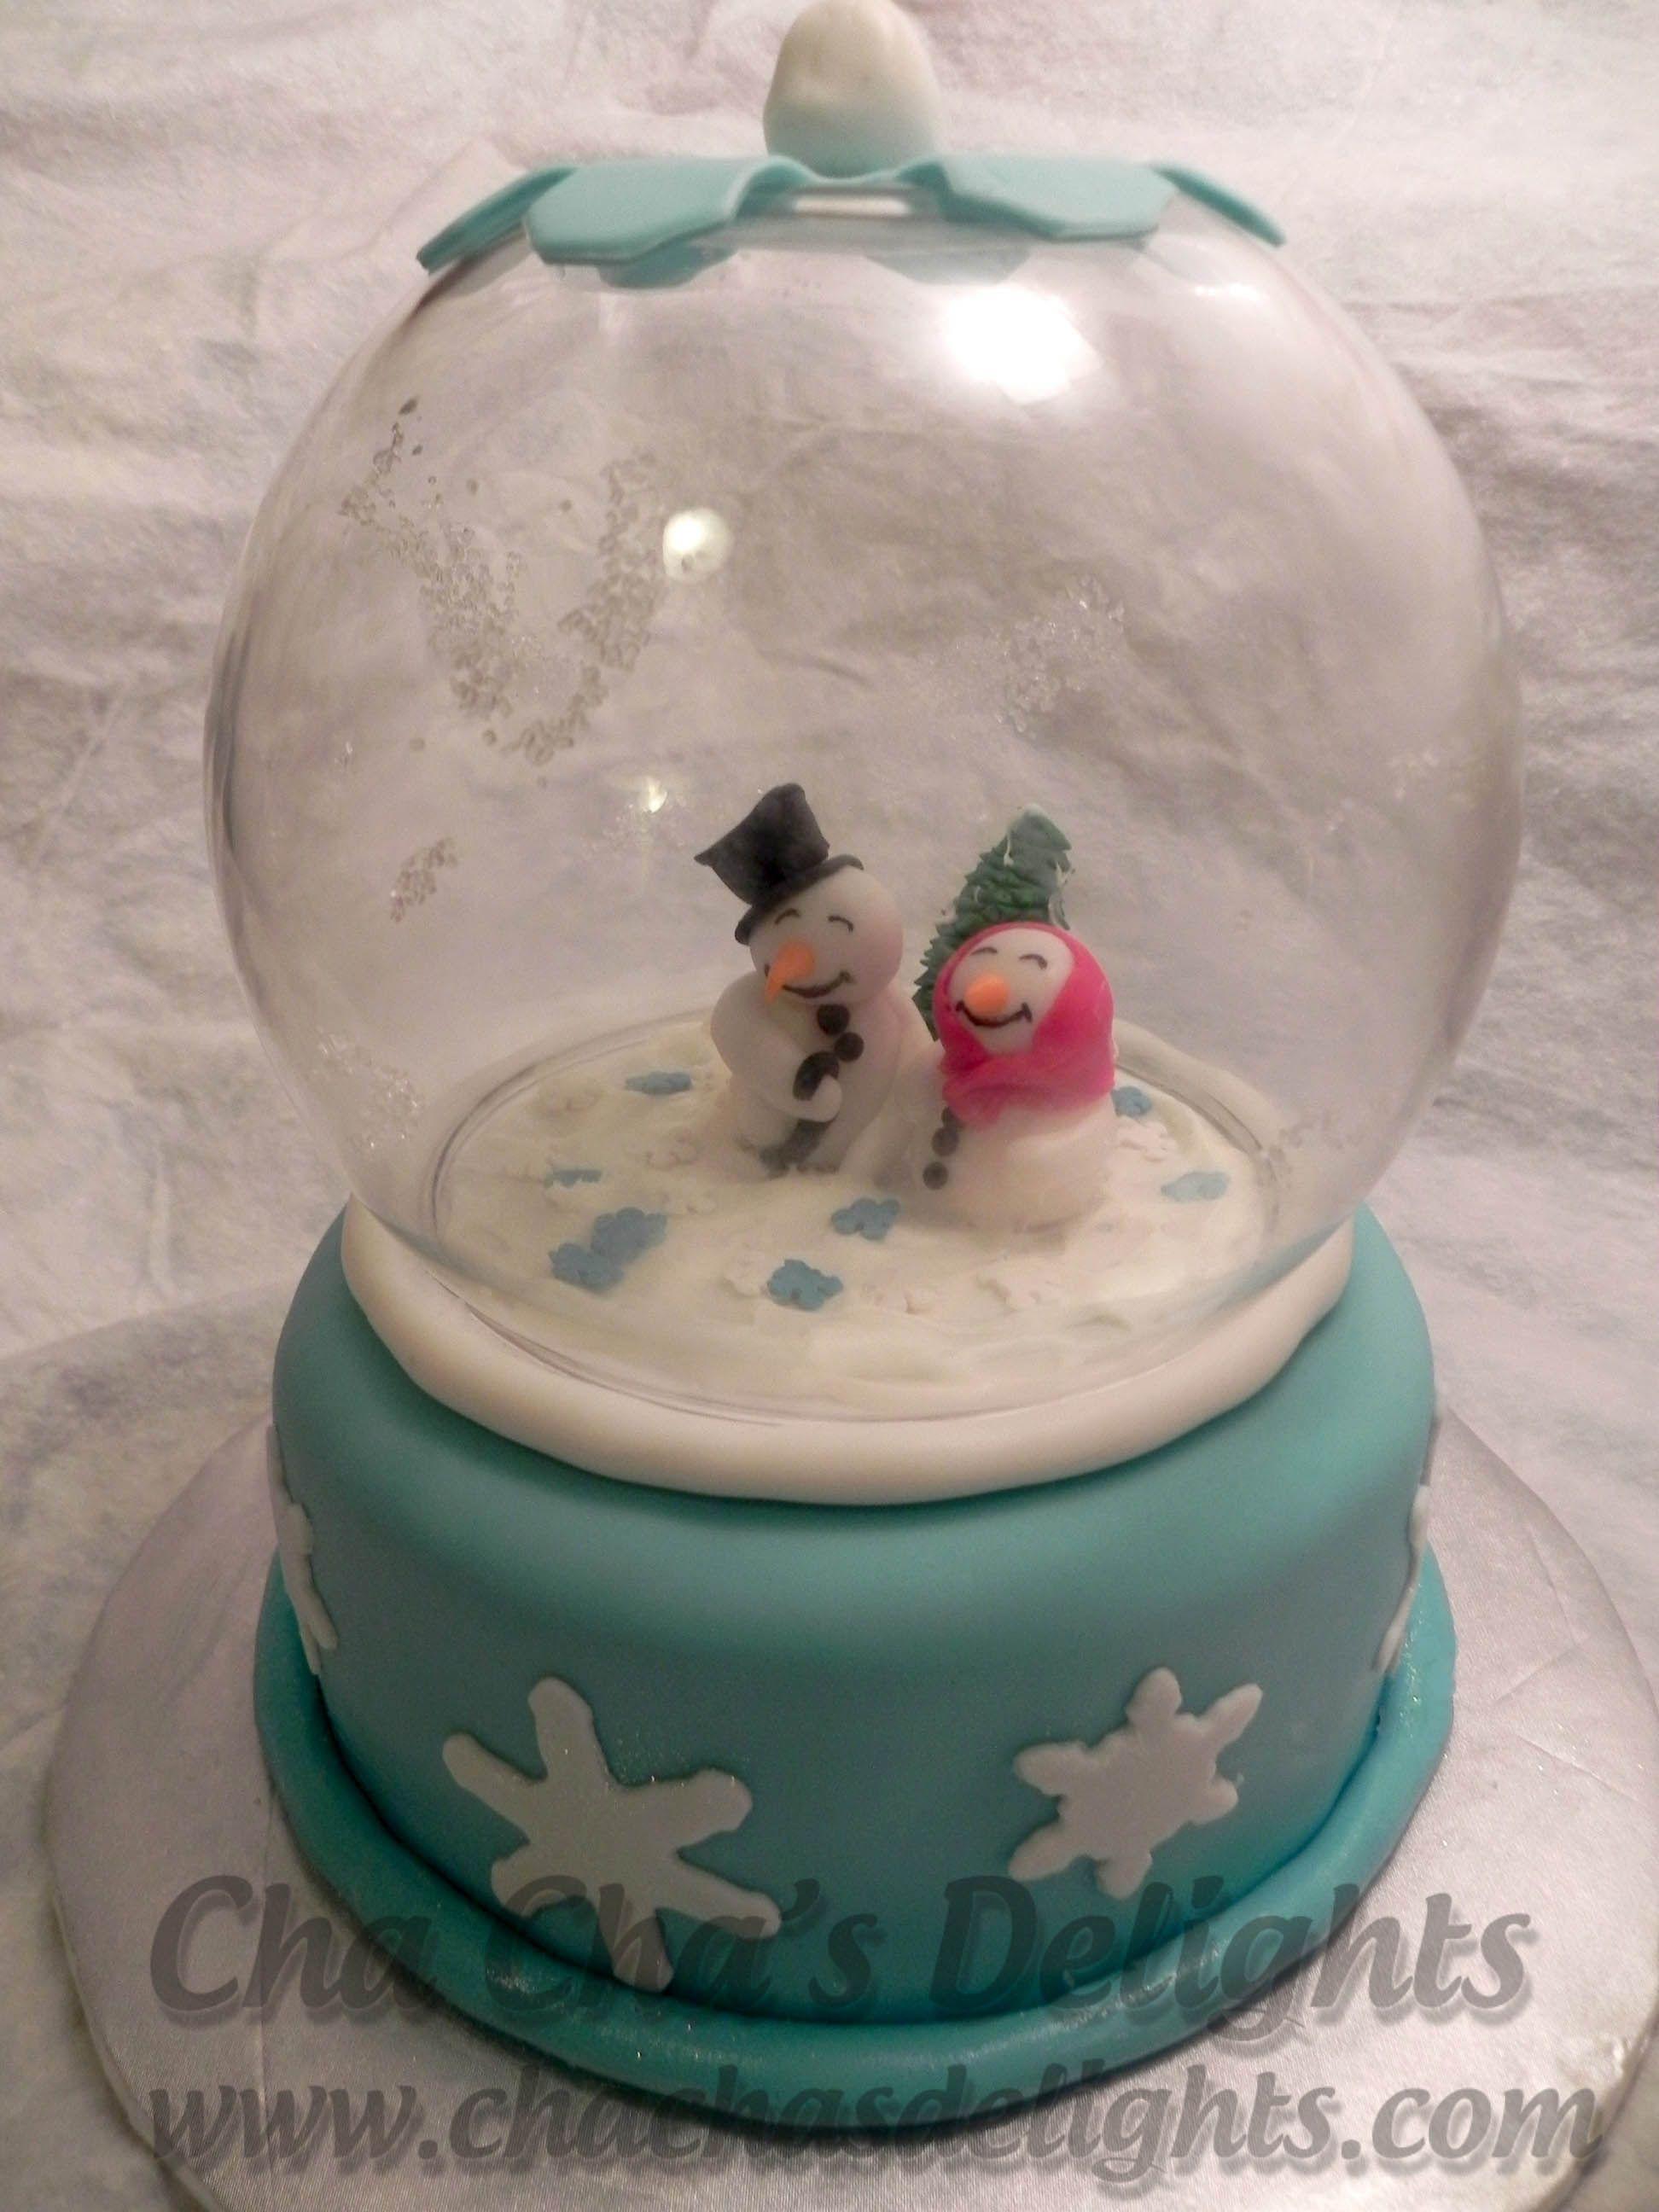 Snowglobe Custom Cake Birthday Cakes Orlando Pinterest Custom